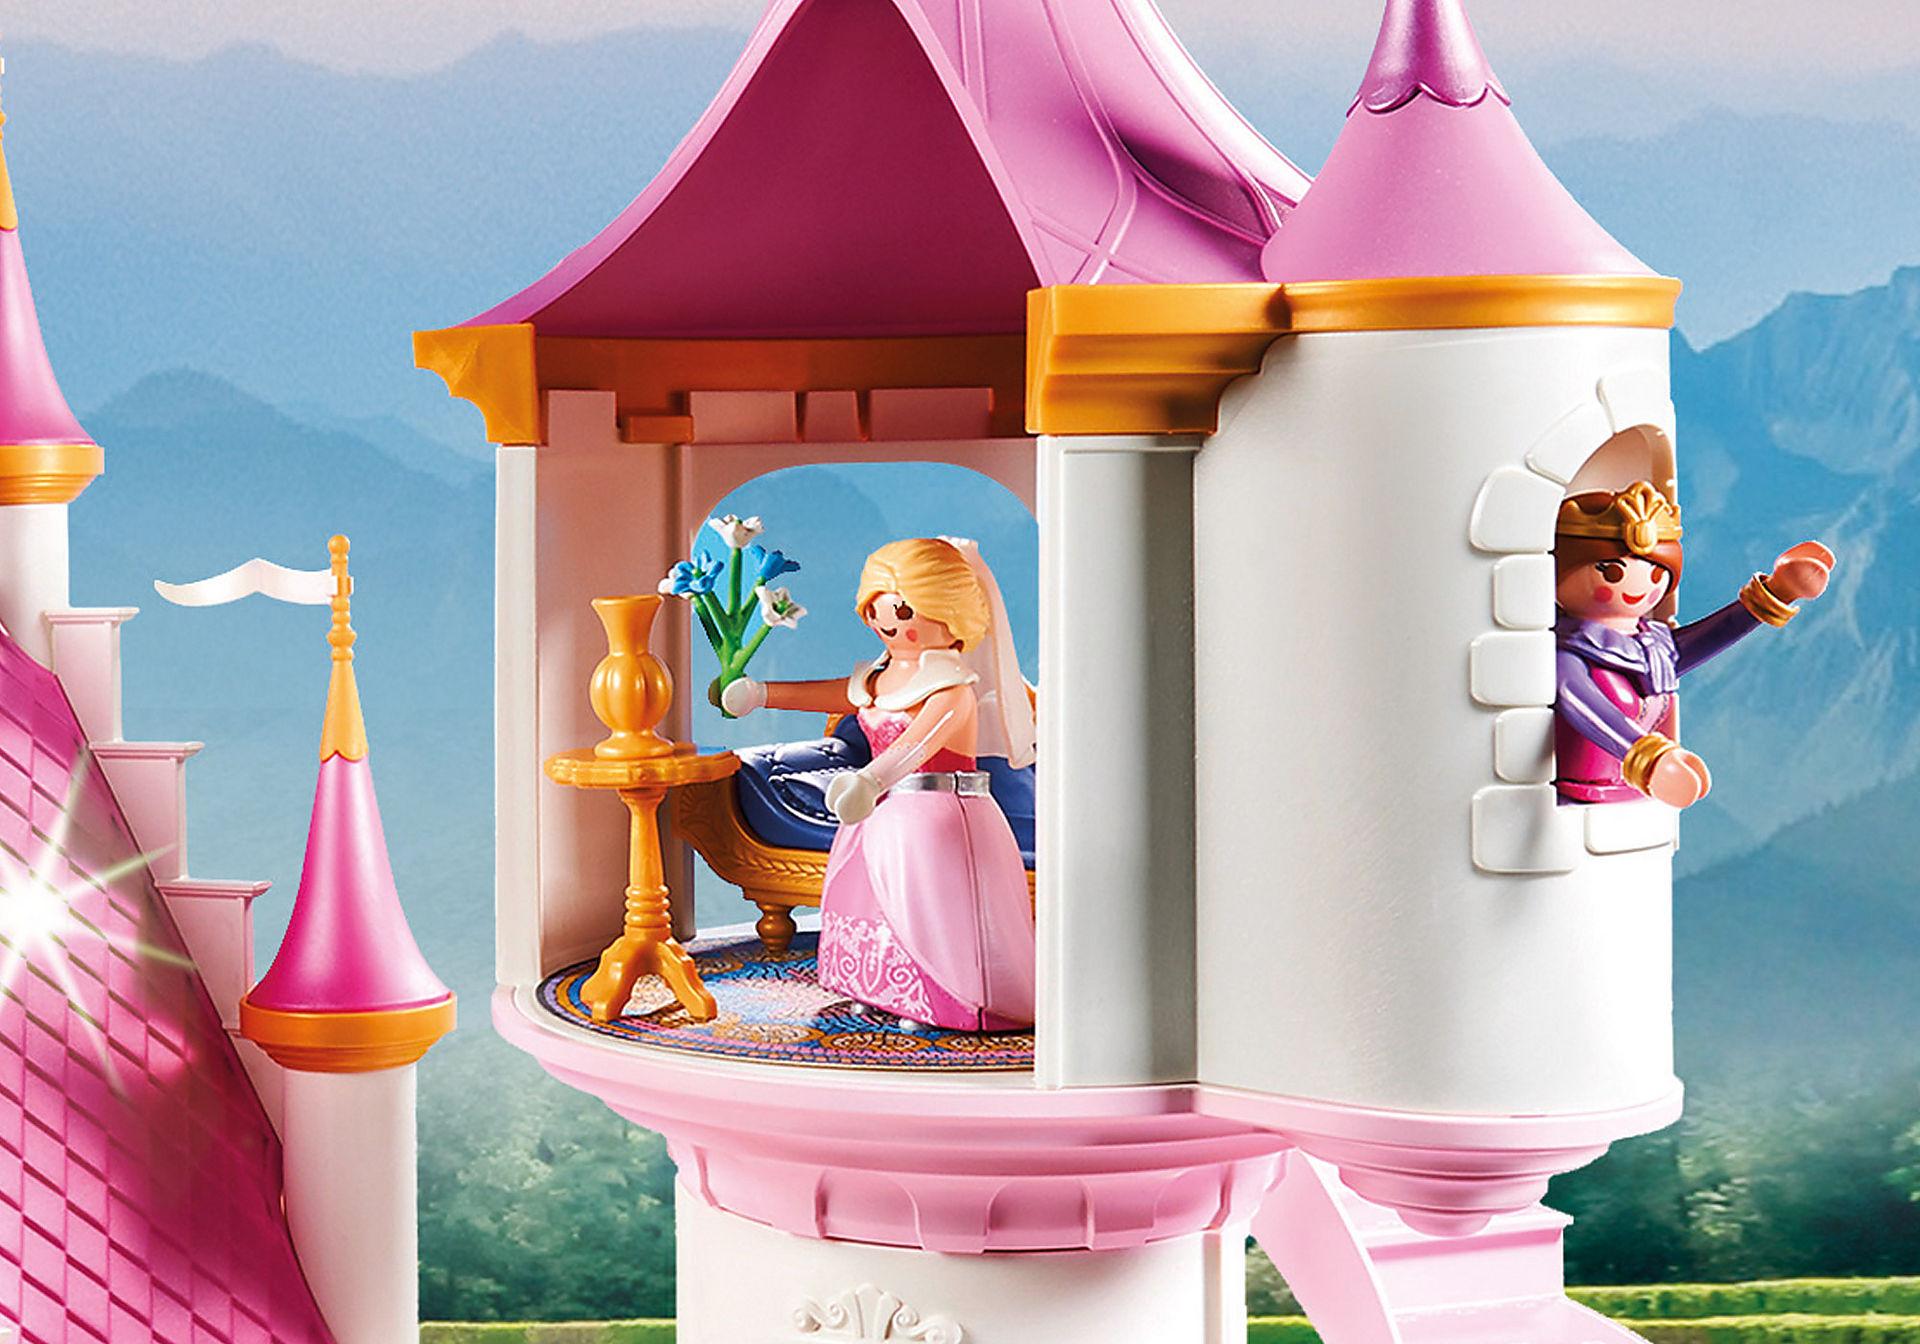 70447 Großes Prinzessinnenschloss zoom image10